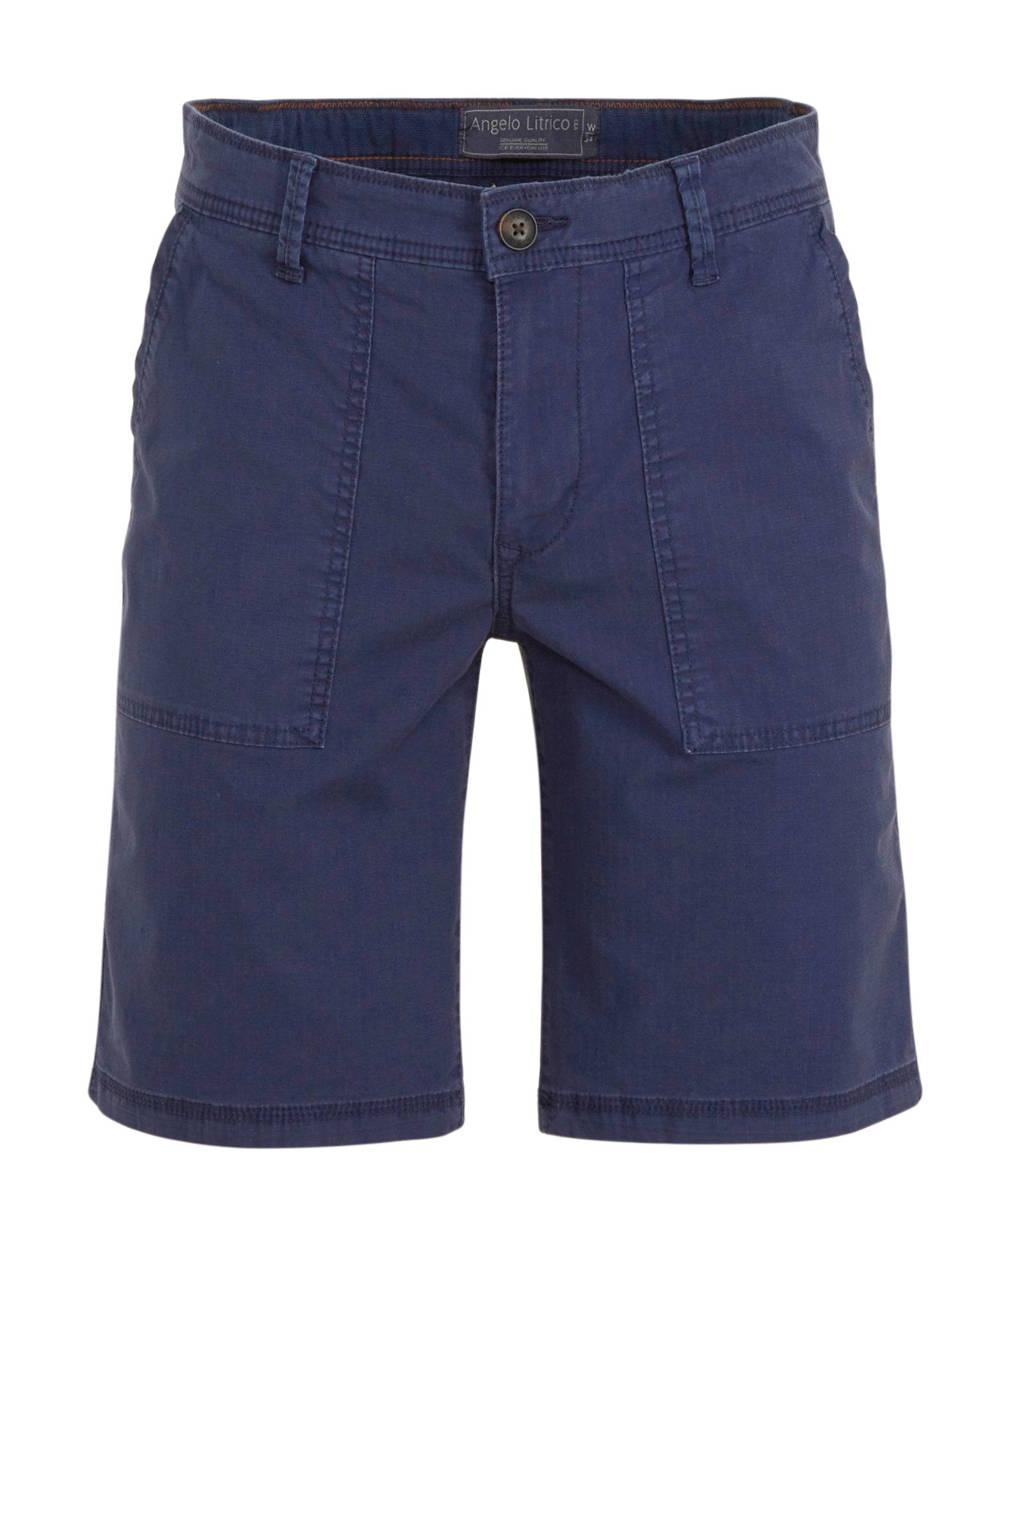 C&A regular fit bermuda donkerblauw, Donkerblauw